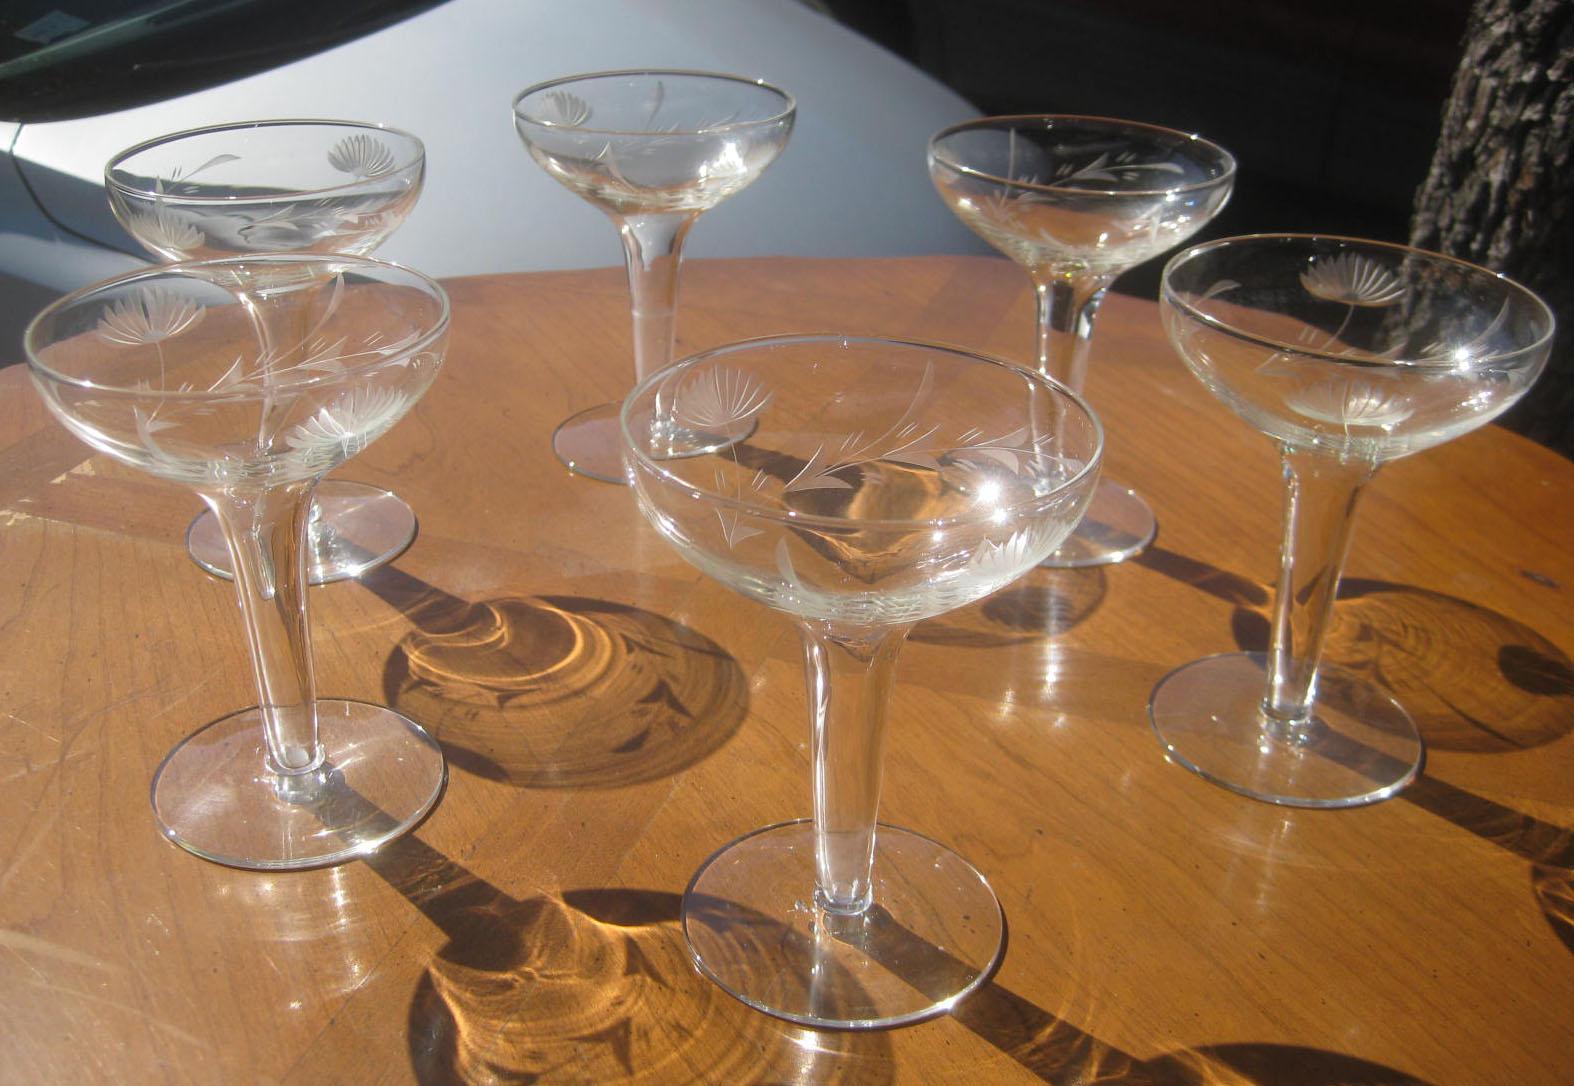 Uhuru furniture collectibles sold vintage hollow stem champagne glasses 20 - Champagne flutes hollow stem ...